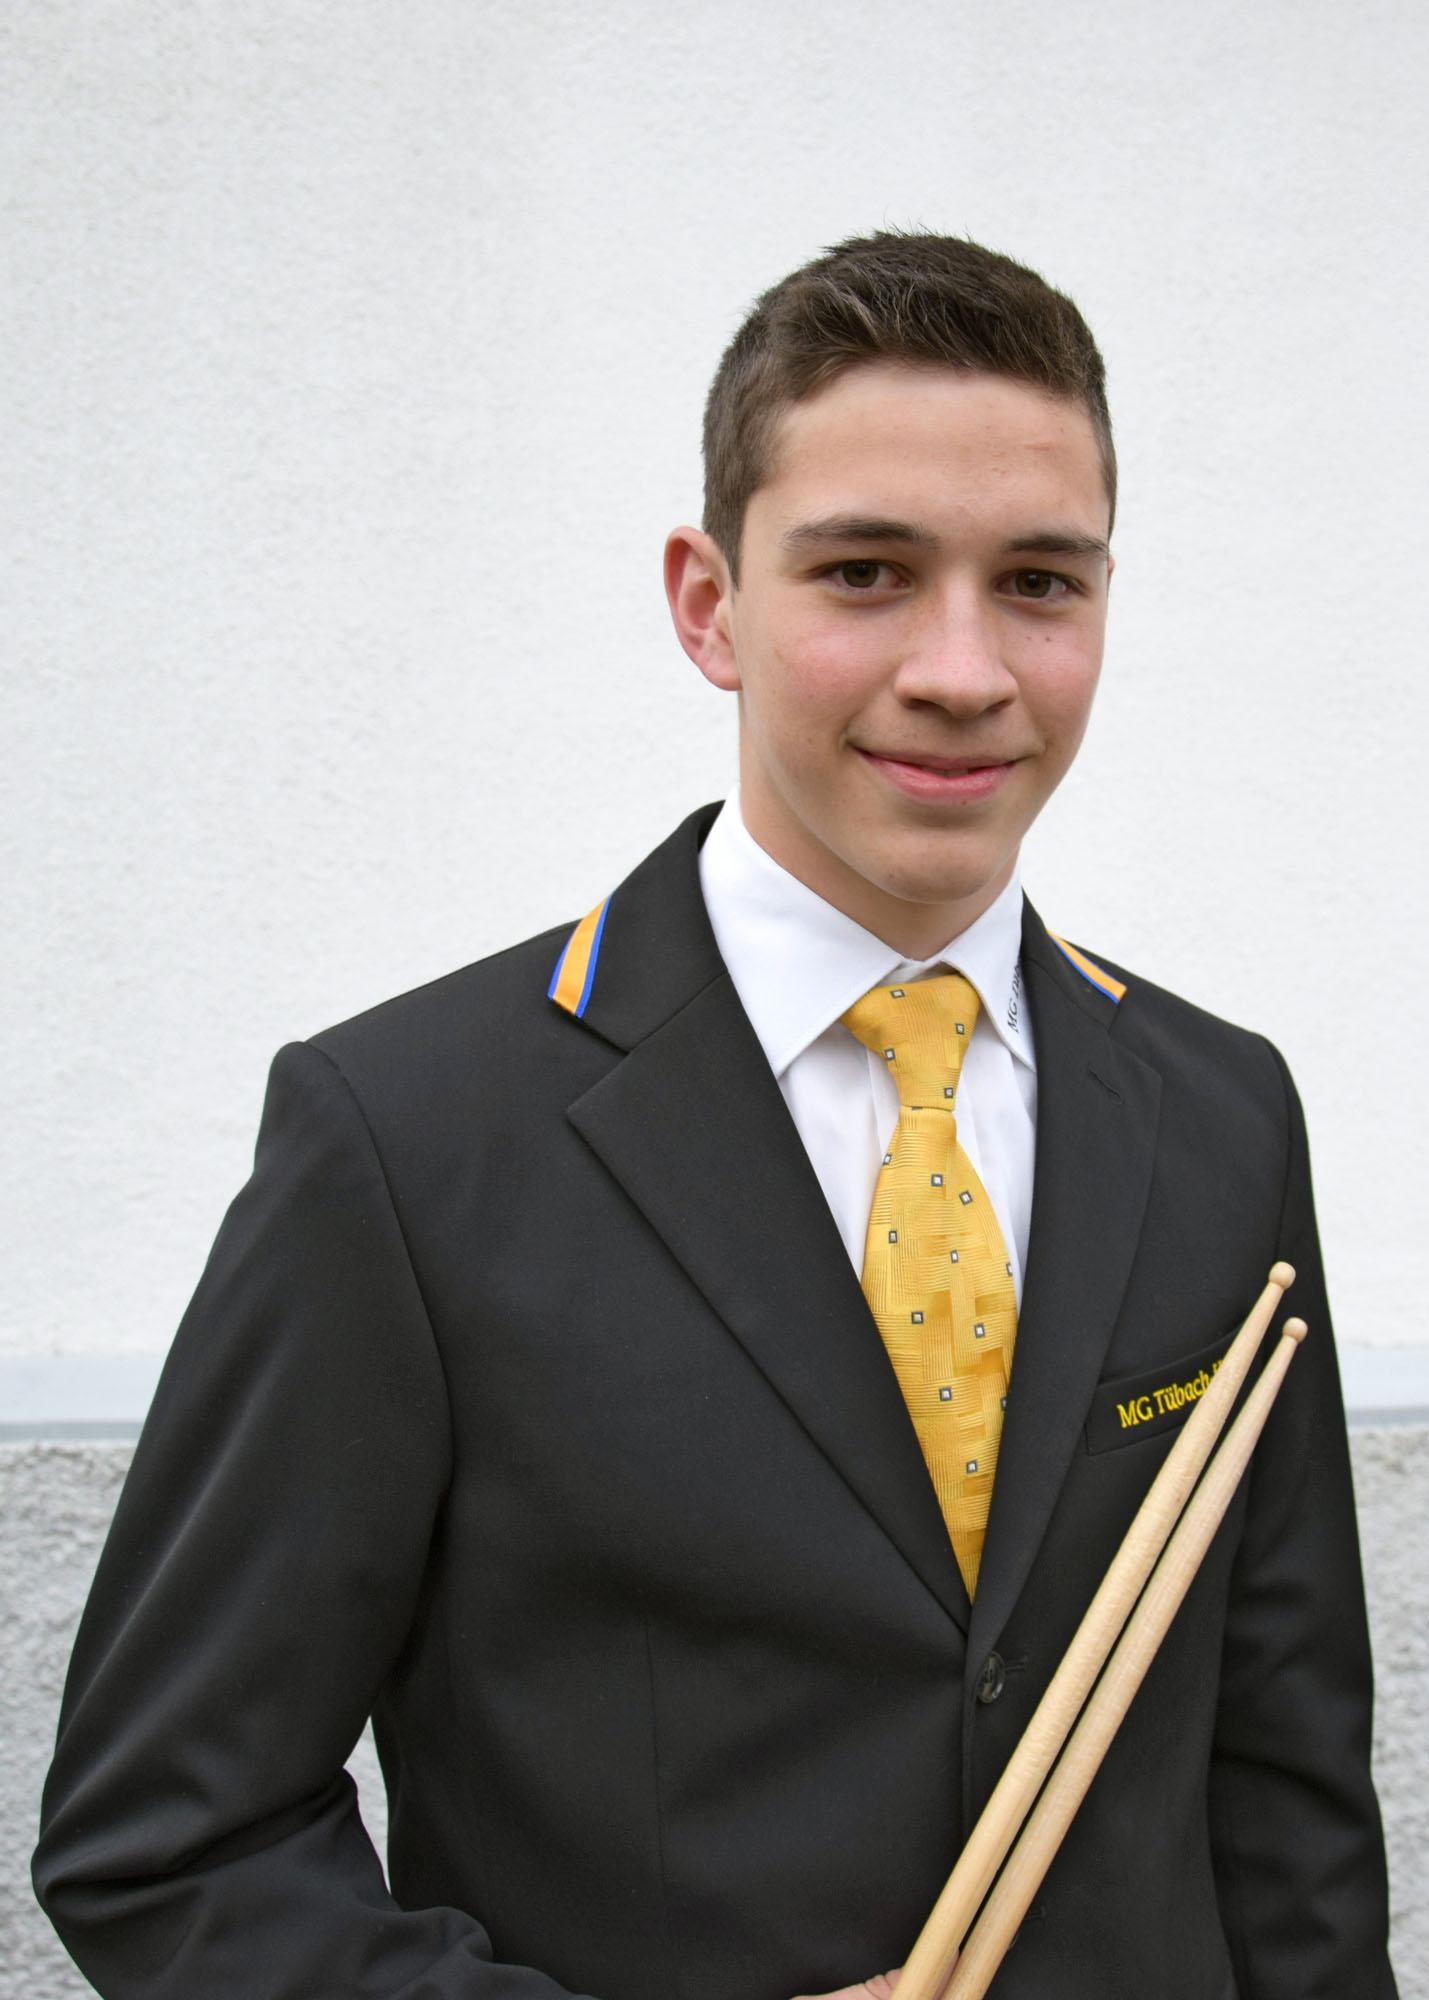 Adrian Popp